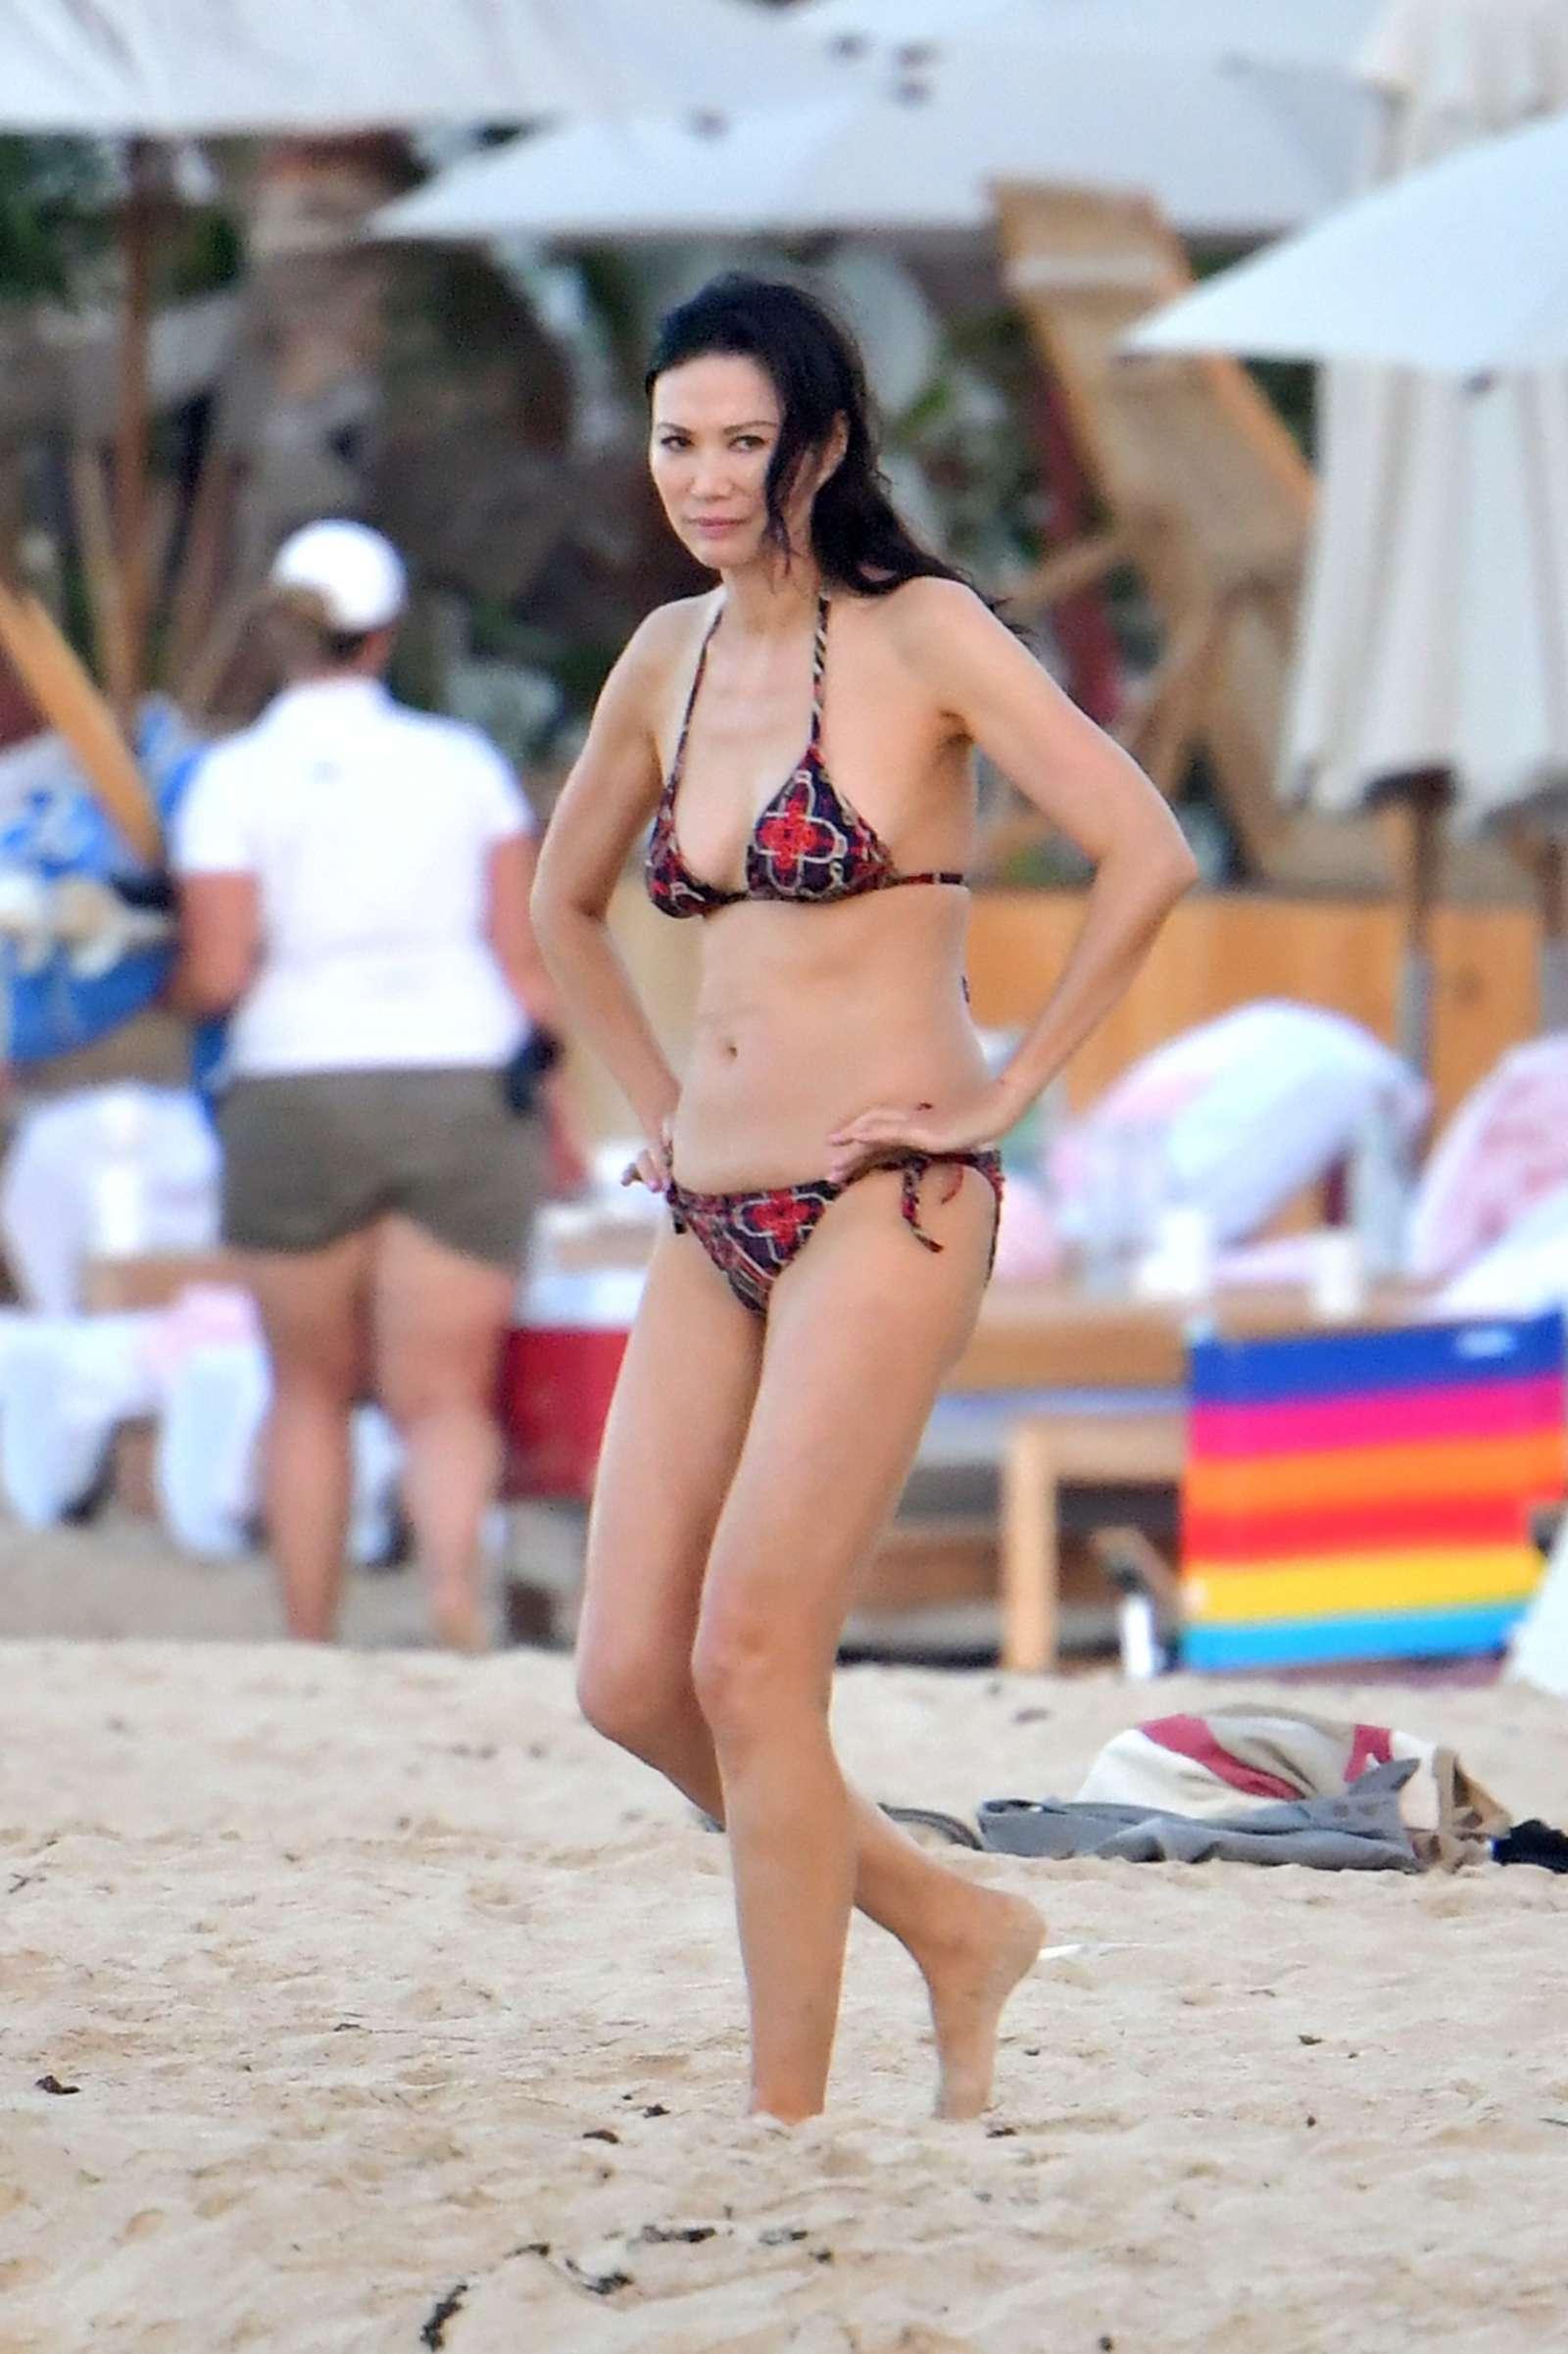 Wendi Deng Murdoch Bikini Nude Photos 98